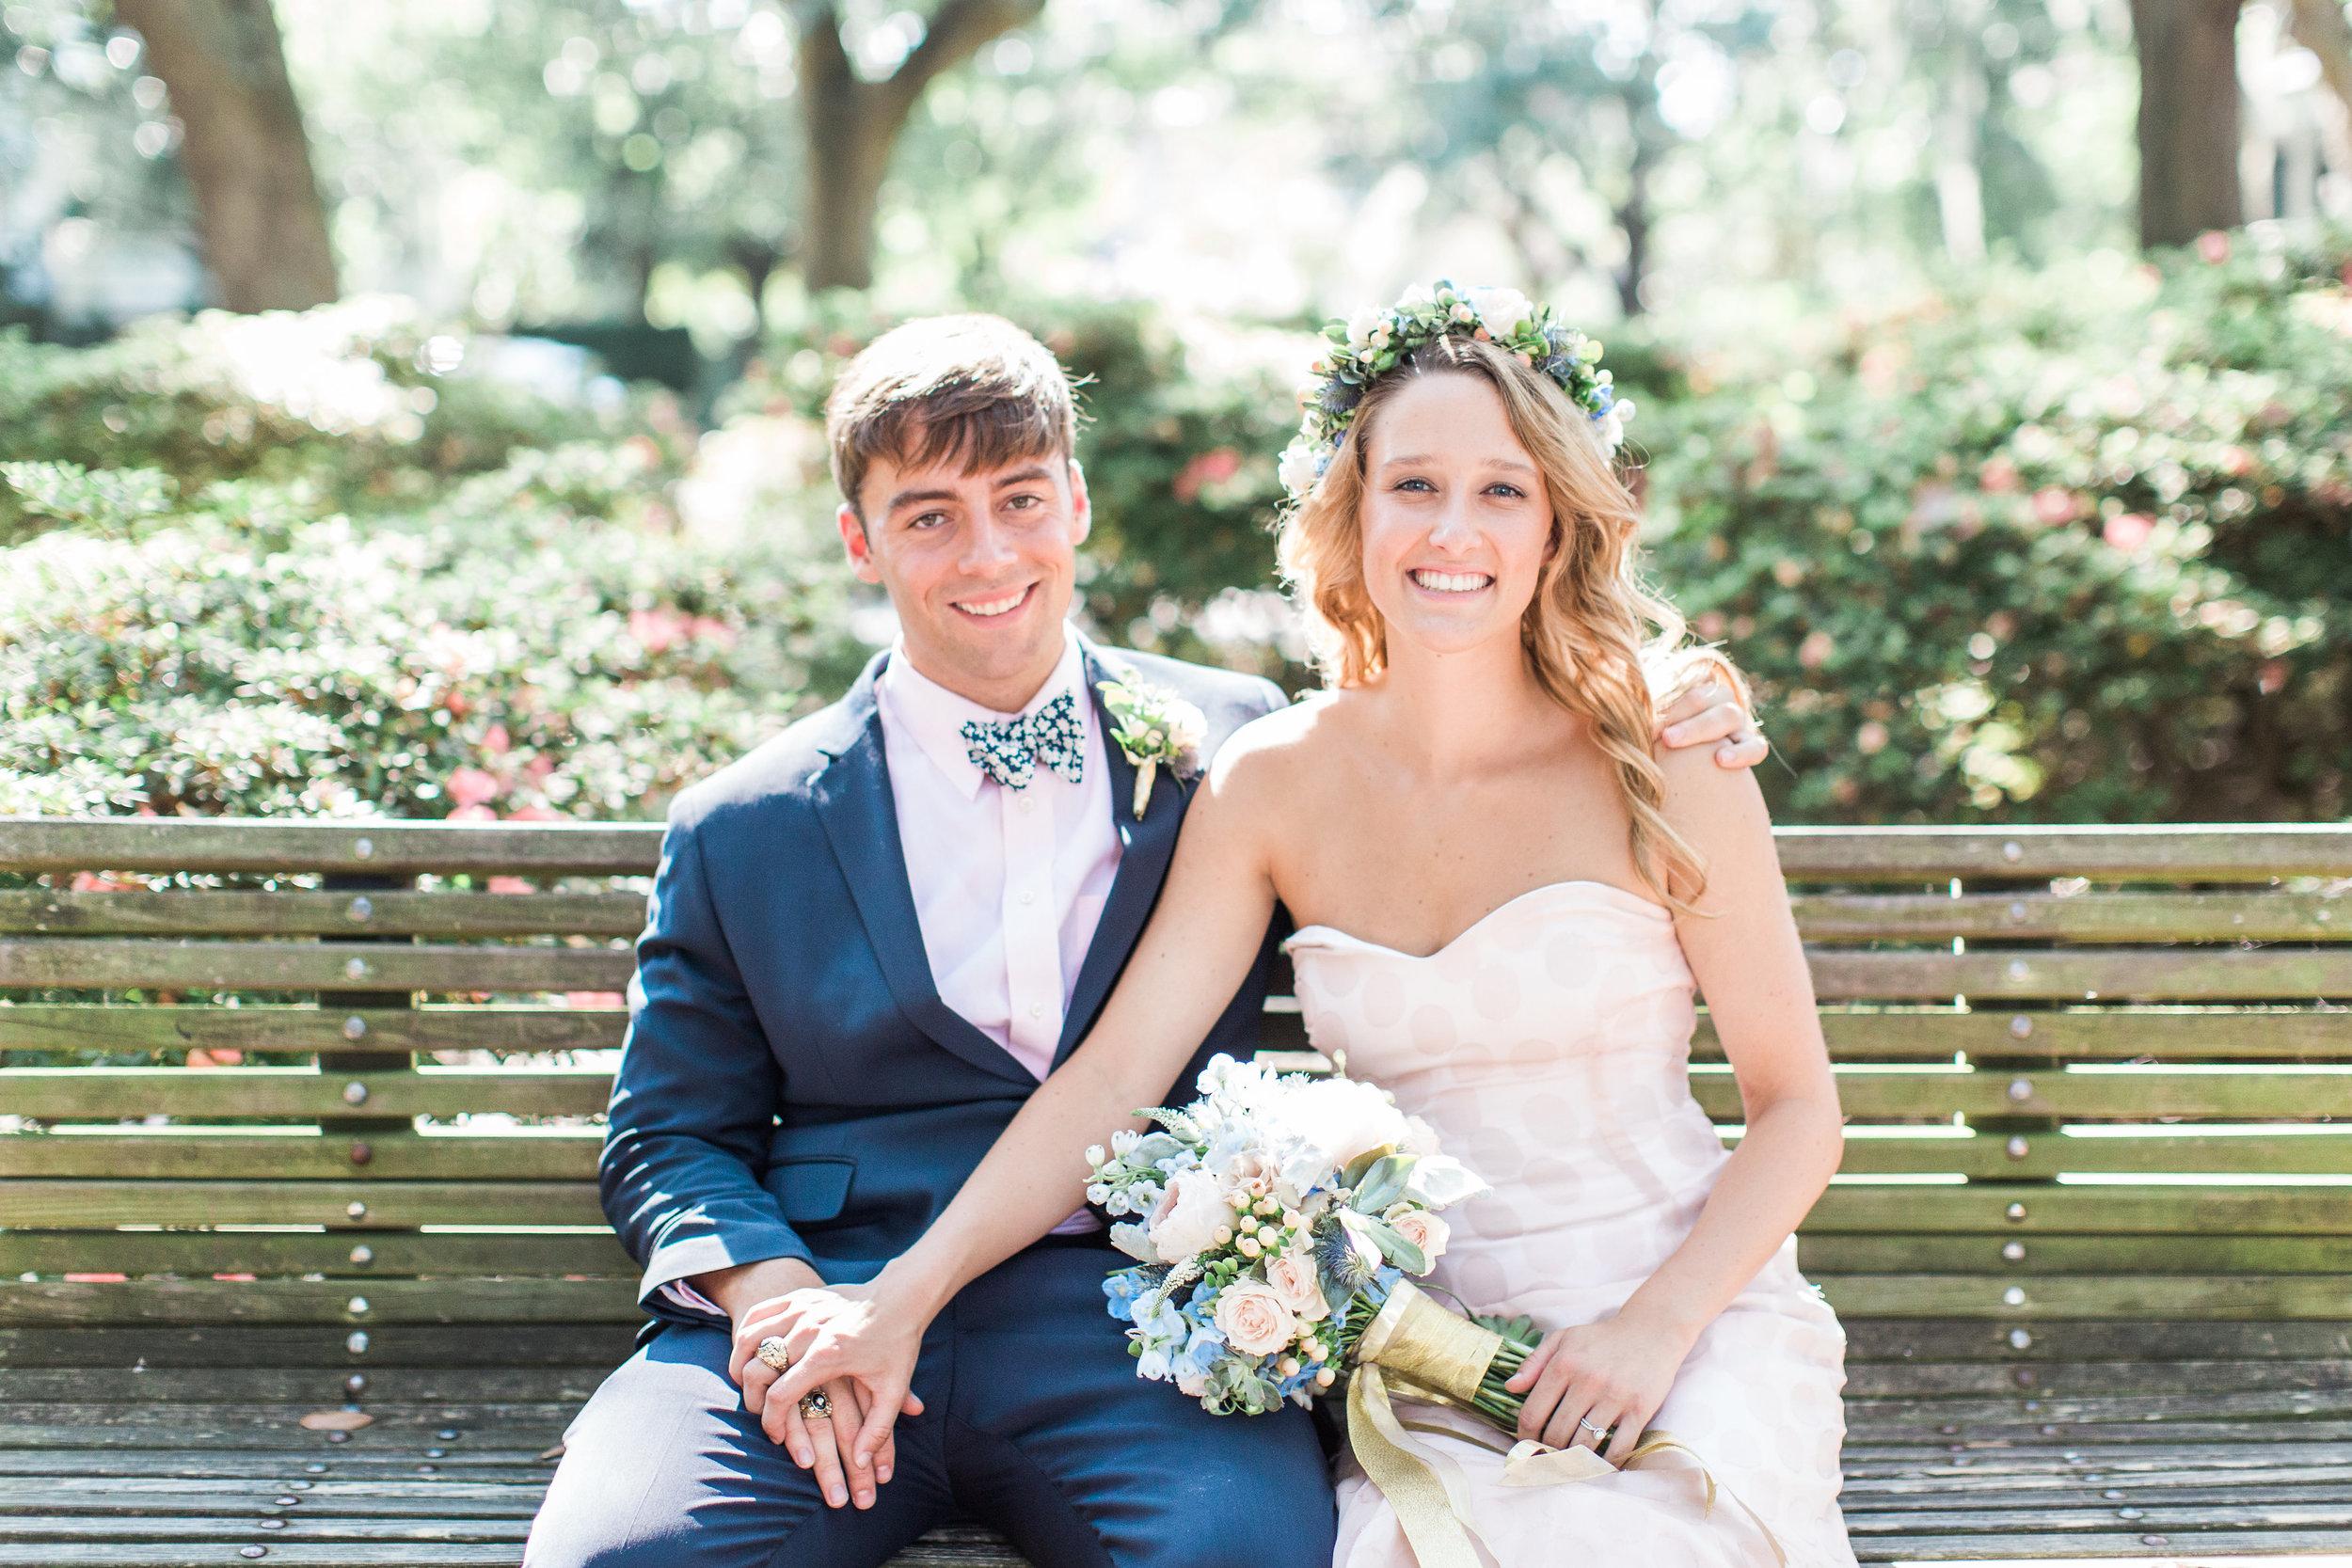 Eve & Patrick's Soho South Cafe wedding  //  Savannah wedding photos by Apt B Photography  //  A Lowcountry Wedding Magazine